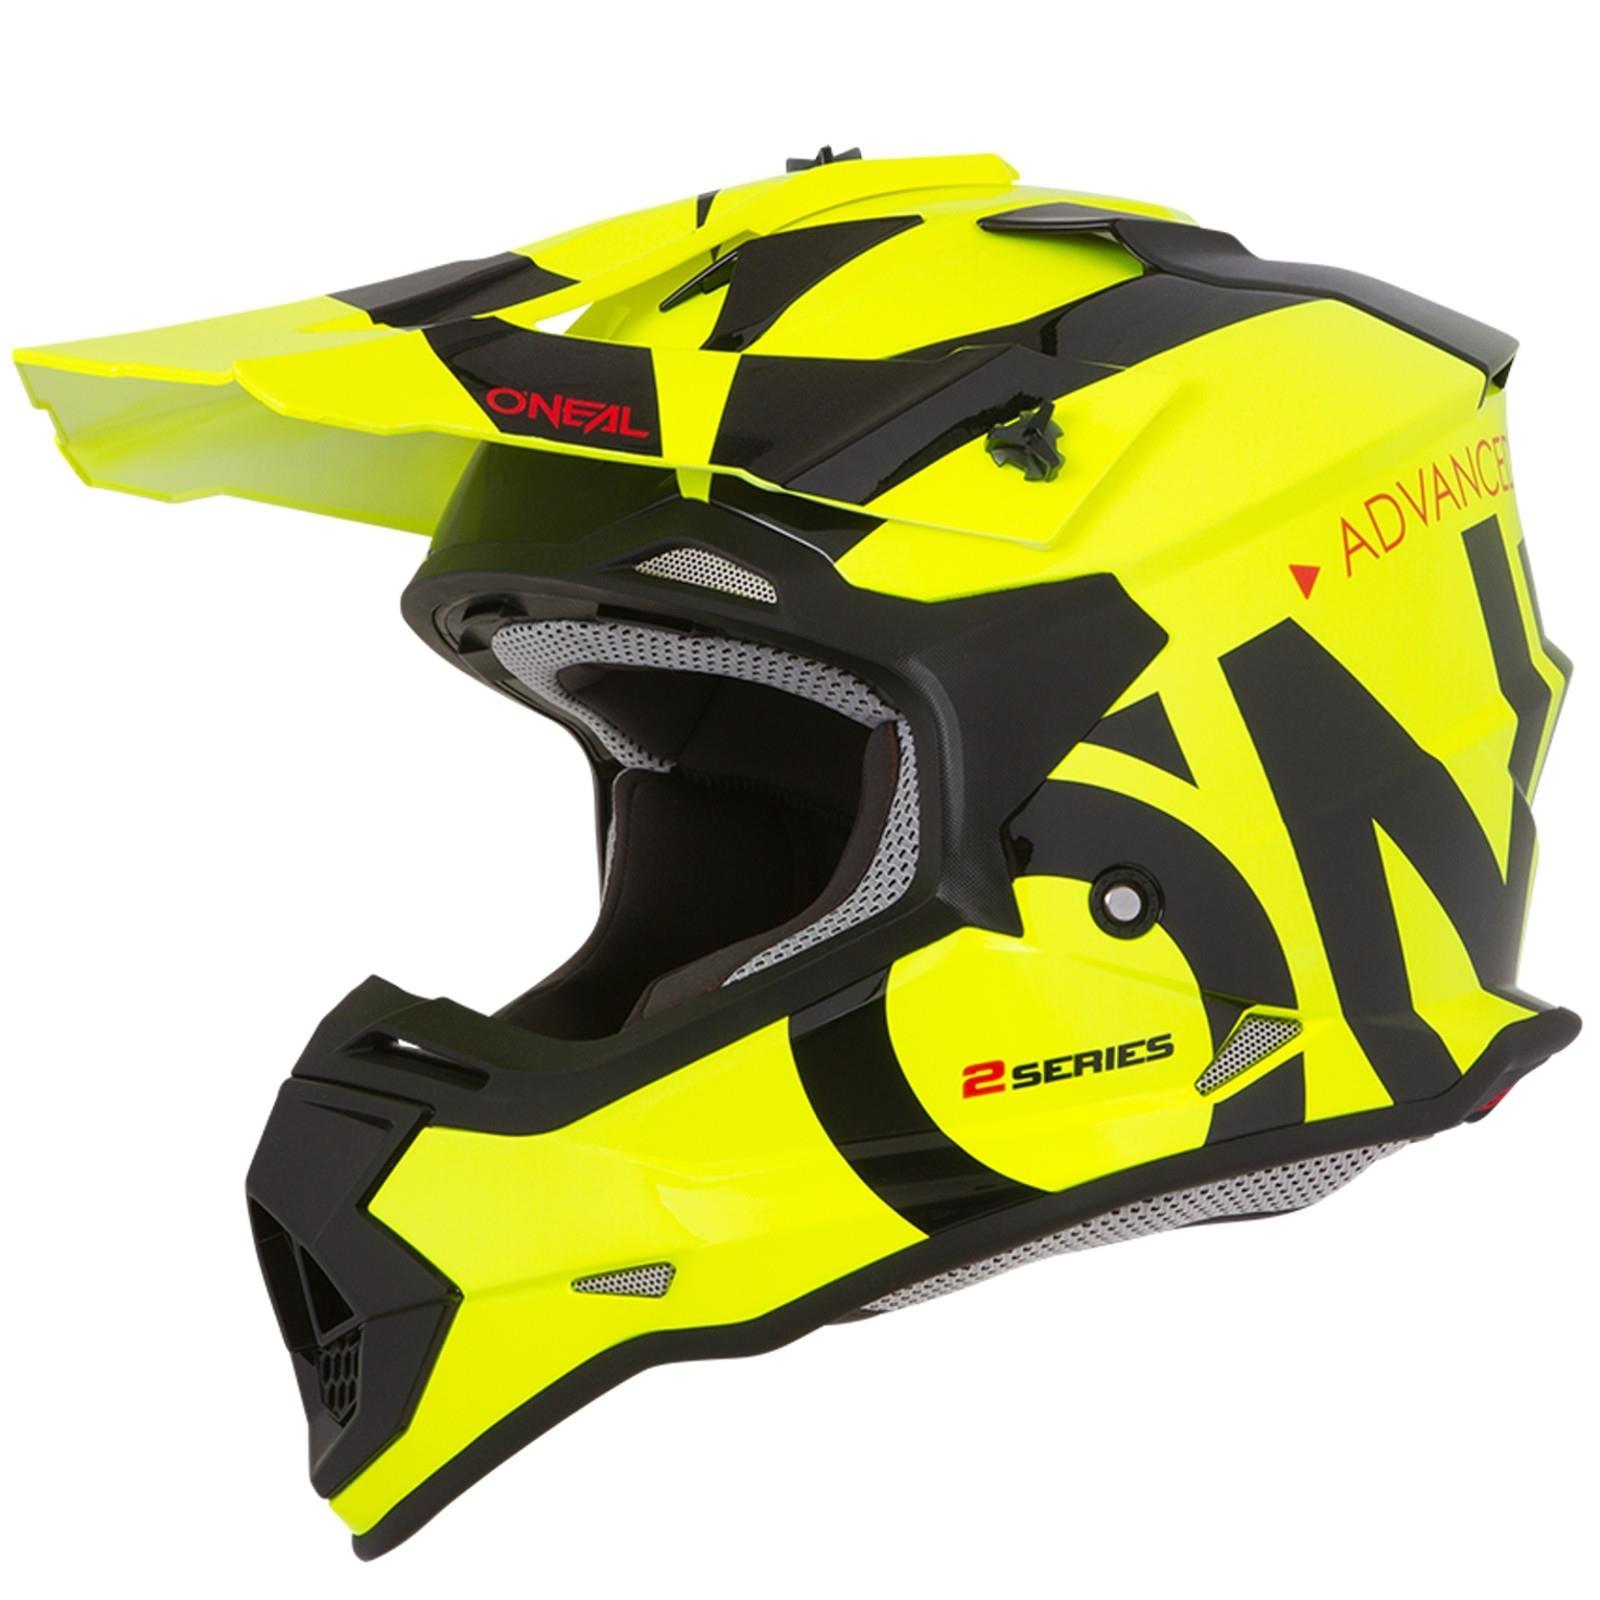 Niños oNeal Moto casco cross casco Moto de kids MX Cross Enduro las chicas los chicos jóvenes 5e51b1